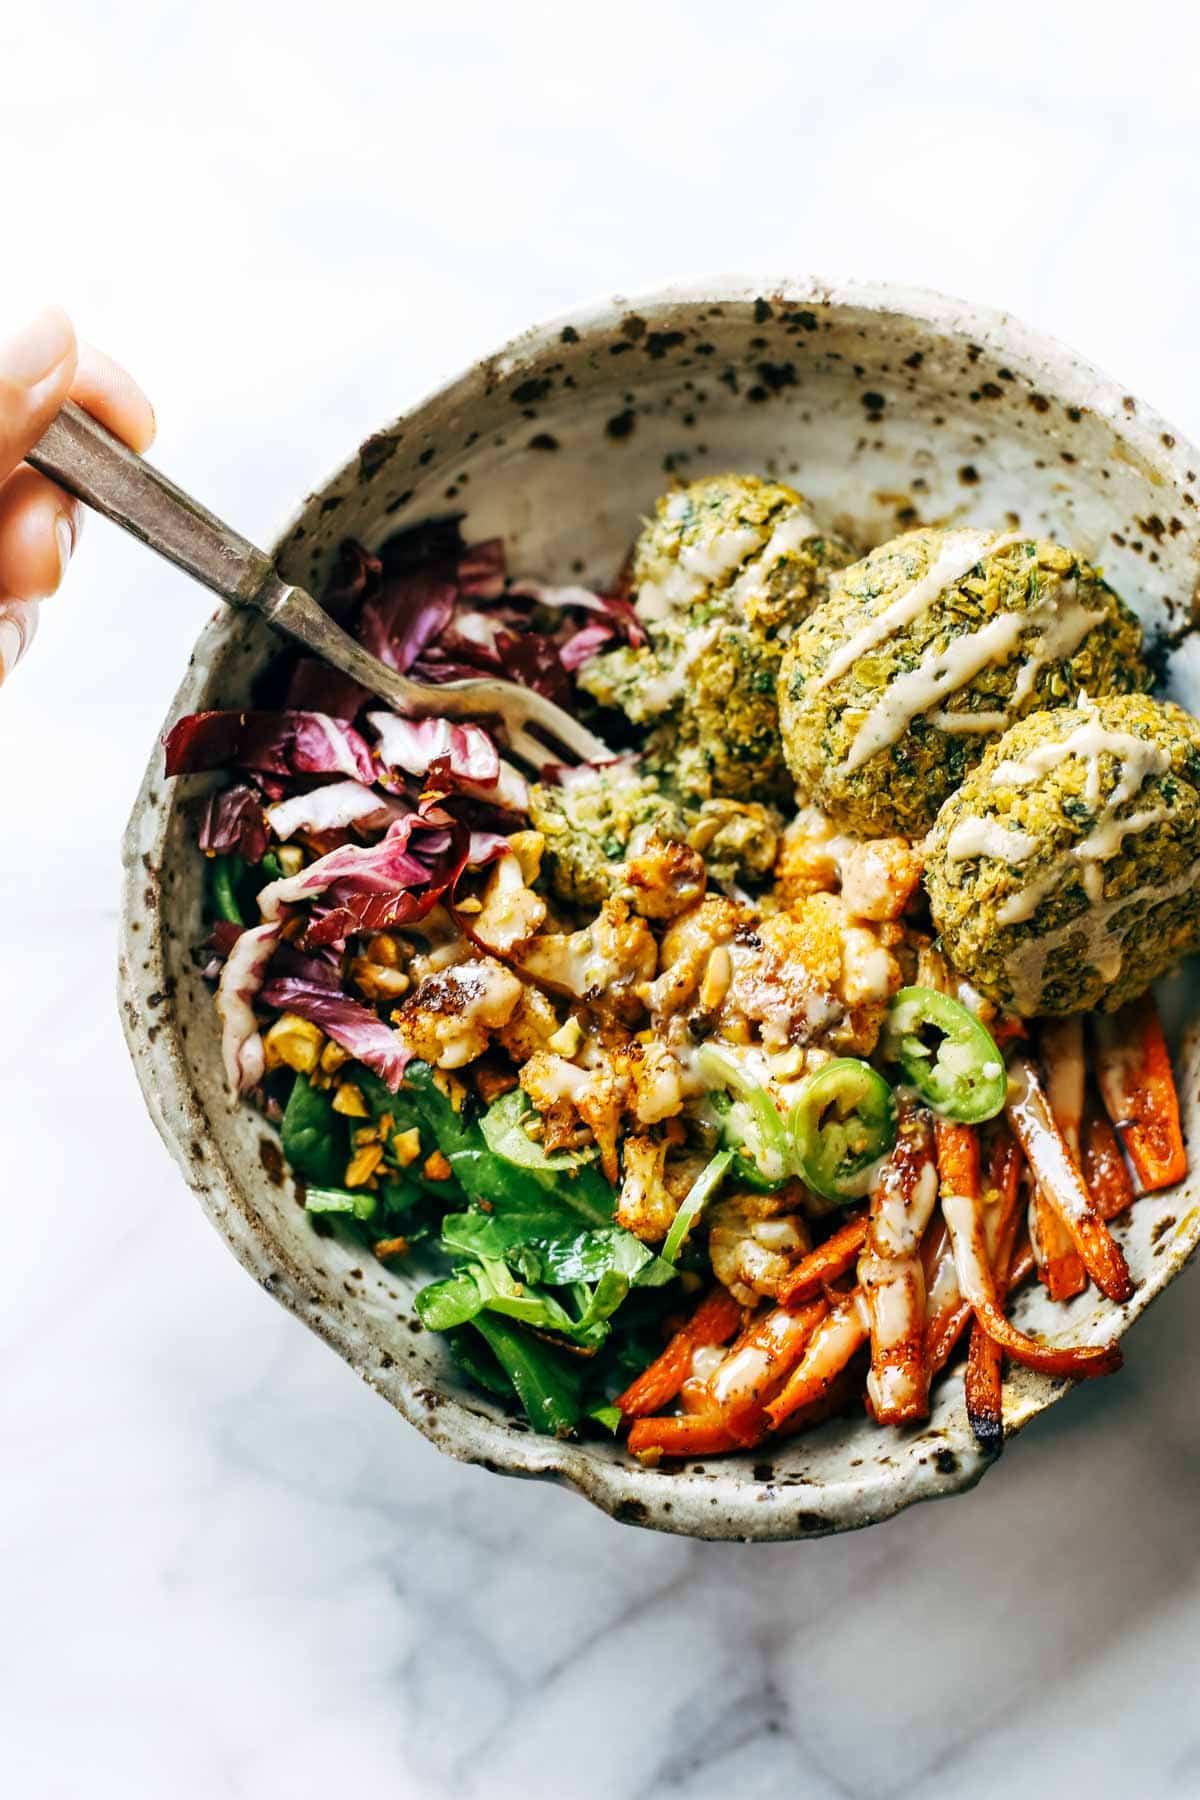 Winter Vegan Recipes  The Ultimate Winter Bliss Bowls Recipe Pinch of Yum